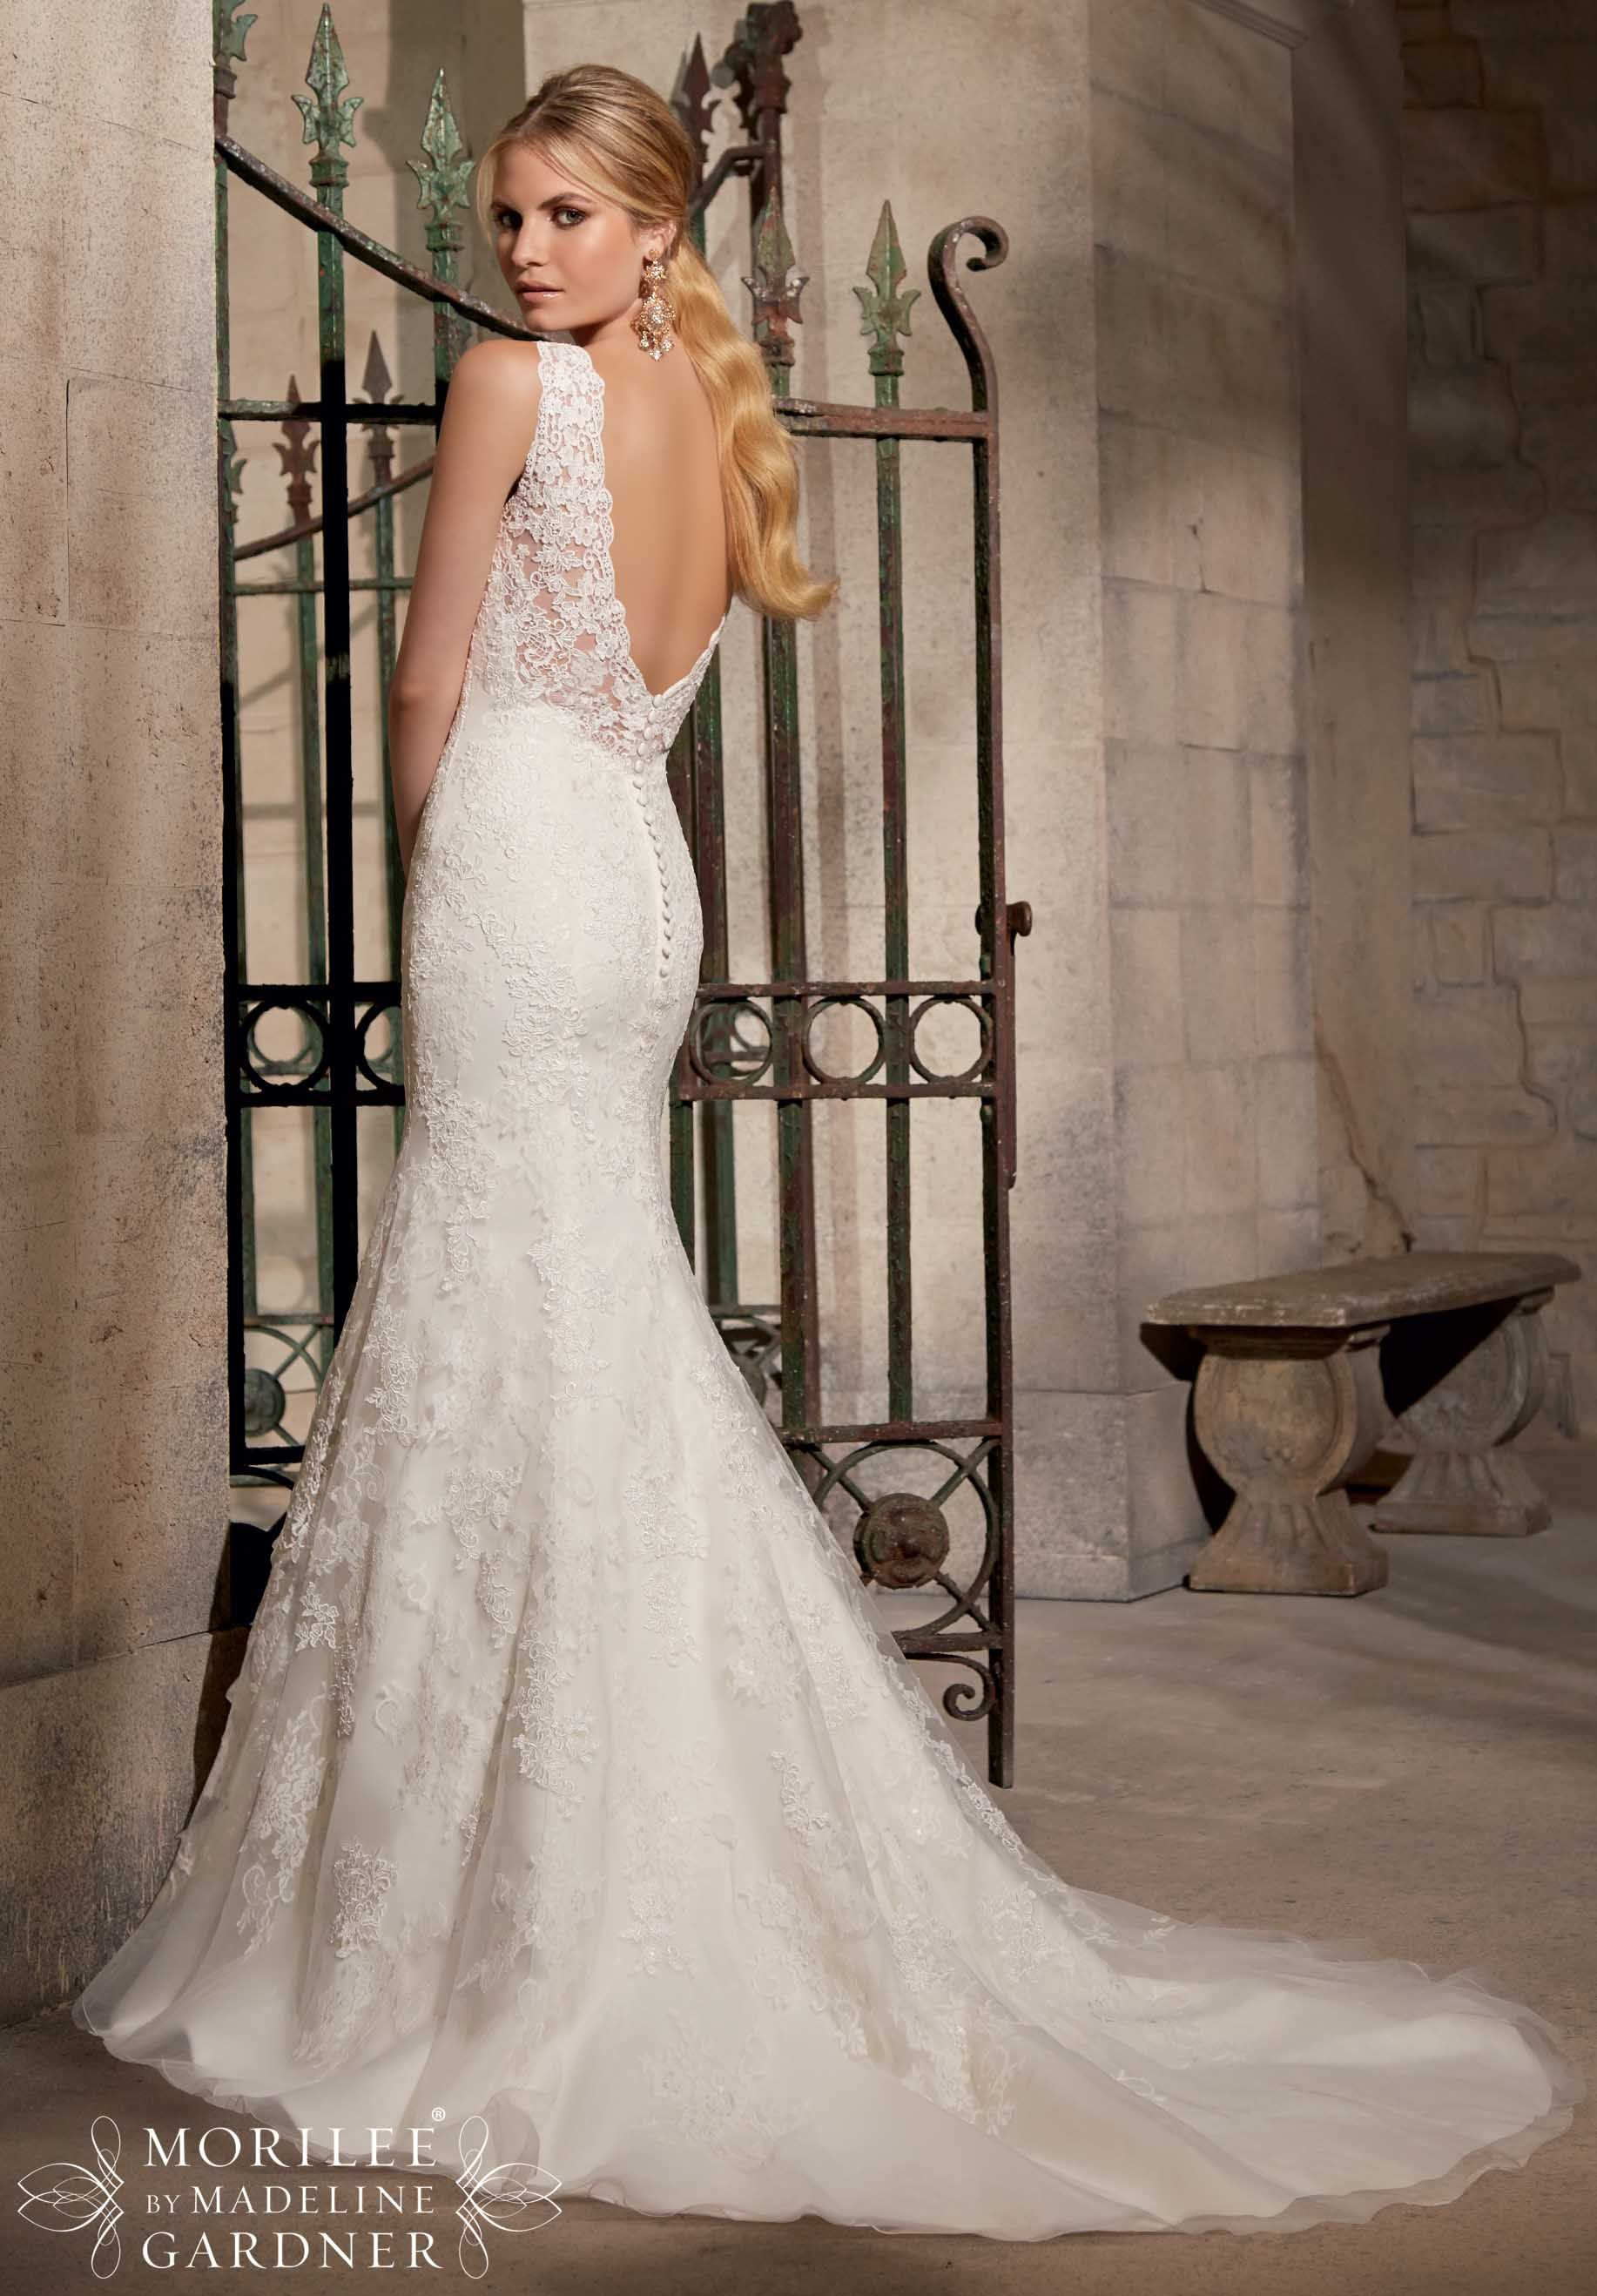 Wedding Bridal Gowns - Designer Morilee – Wedding Dress Style 2714 ...